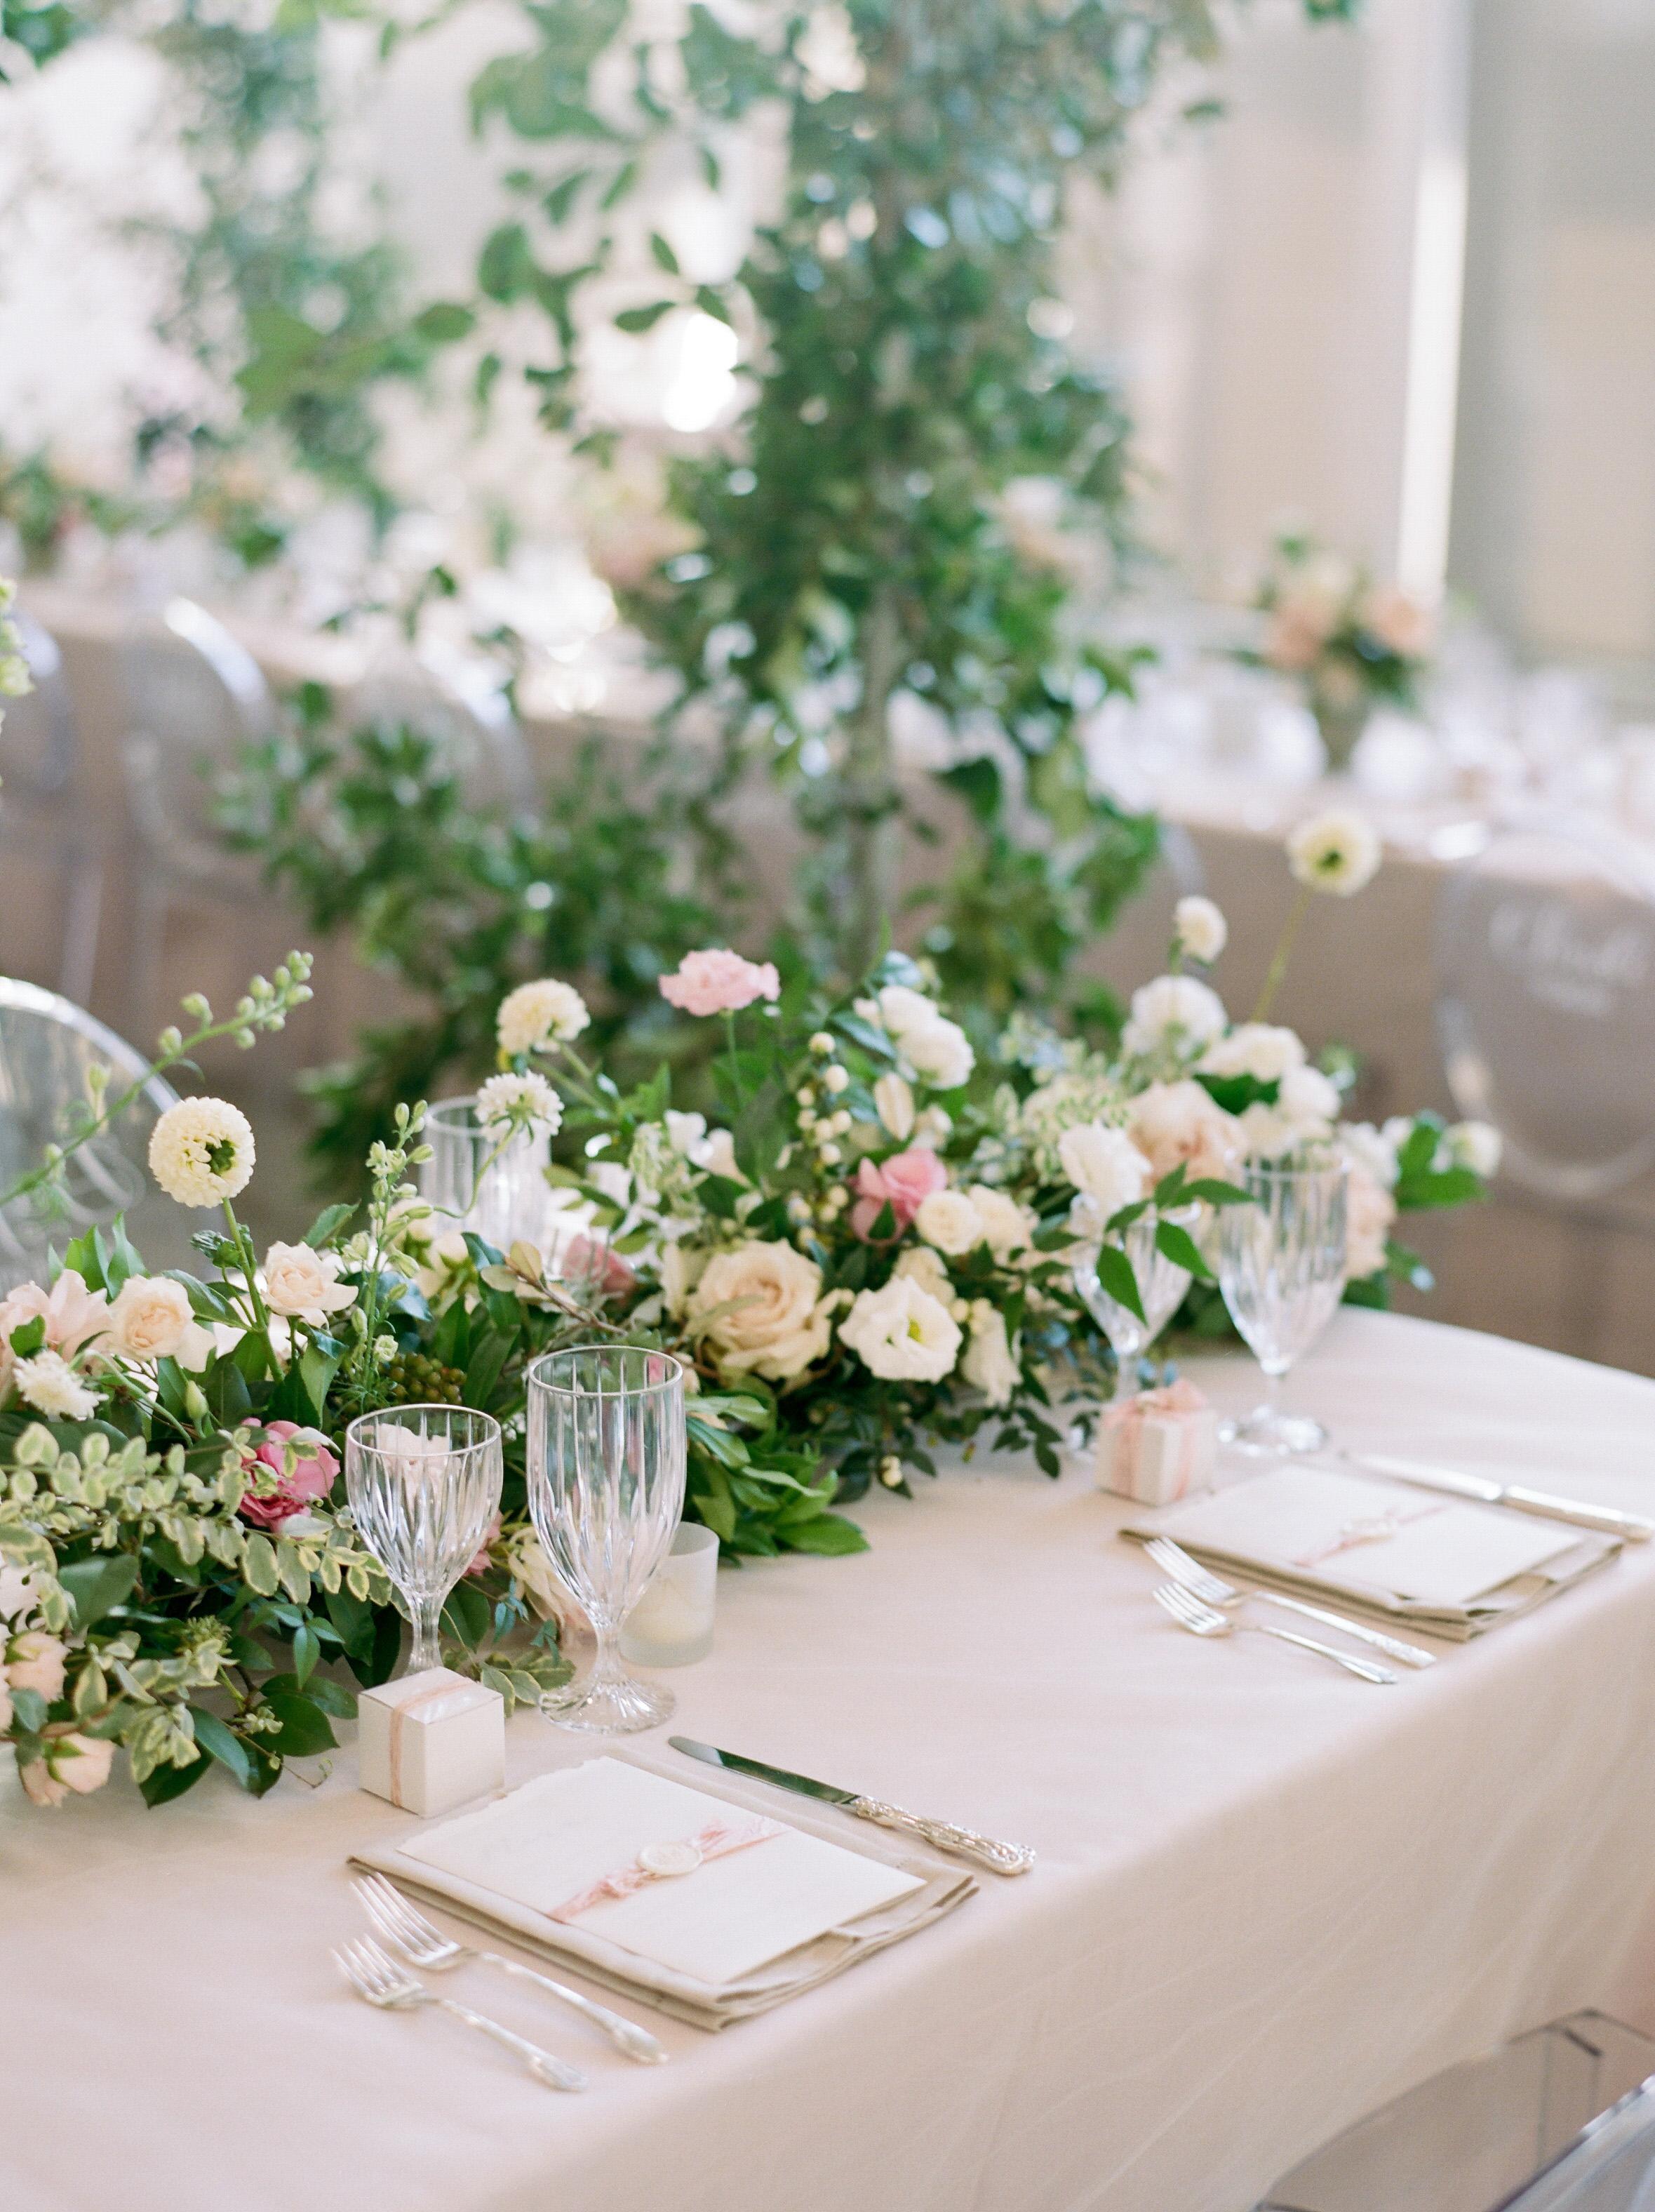 Martha-Stewart-Wedding-Dana-Fernandez-Photography-Josh-Texas-Film-Houston-Wedding-Fine-Art-Photographer-McGovern-Centennial-Gardens-Top-Best-217.jpg